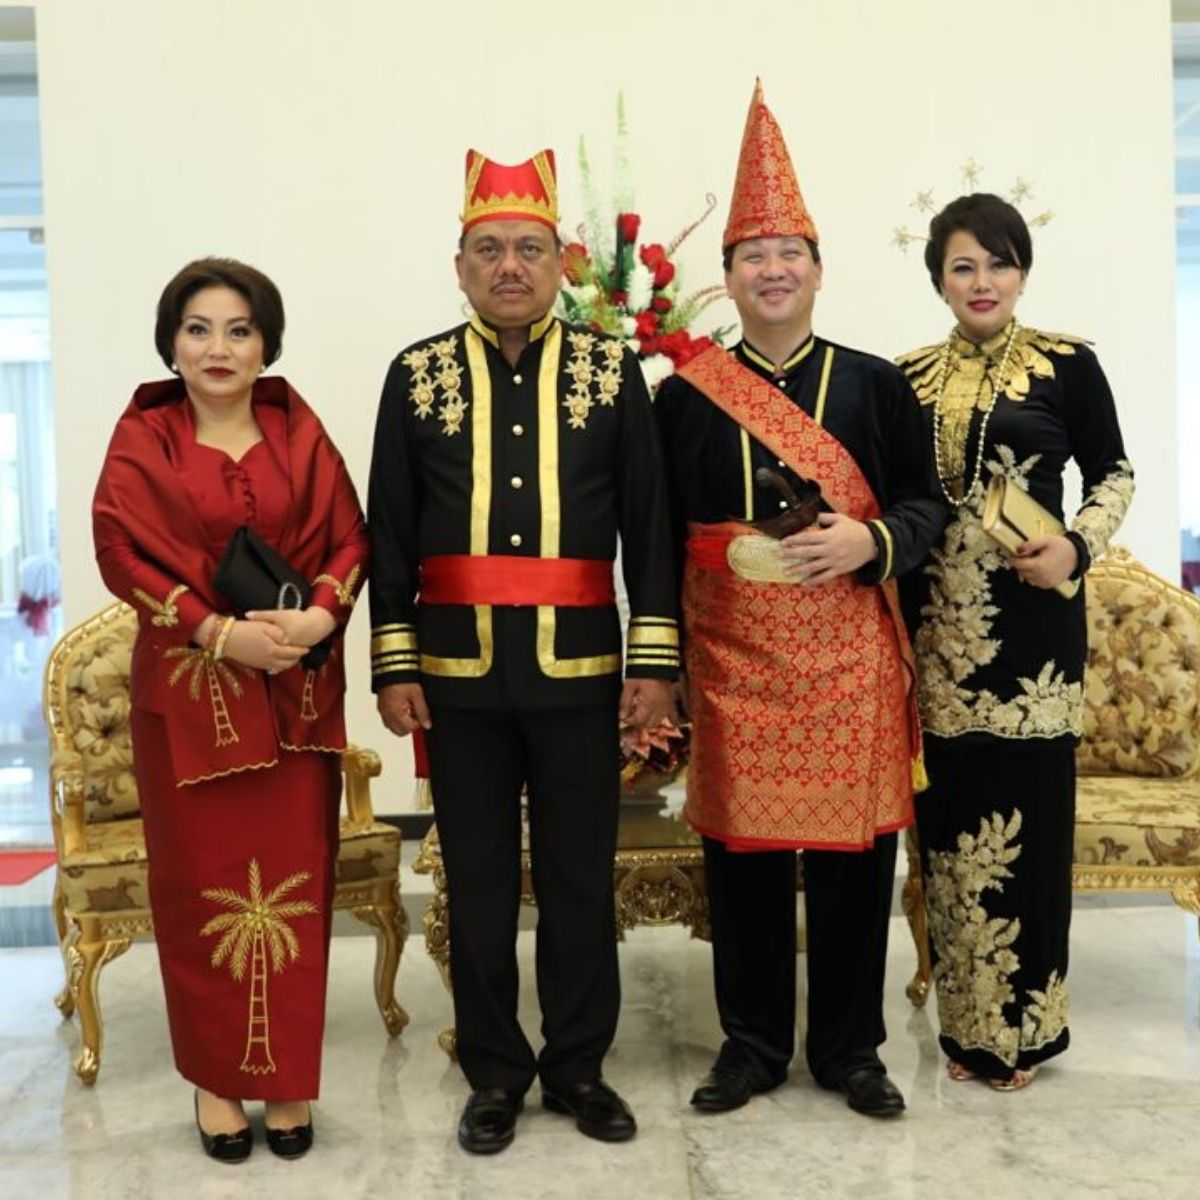 Pakaian Adat Sulawesi Utara Sangihe Taulud, Gorontalo, Minahasa, Tonaas Wangko